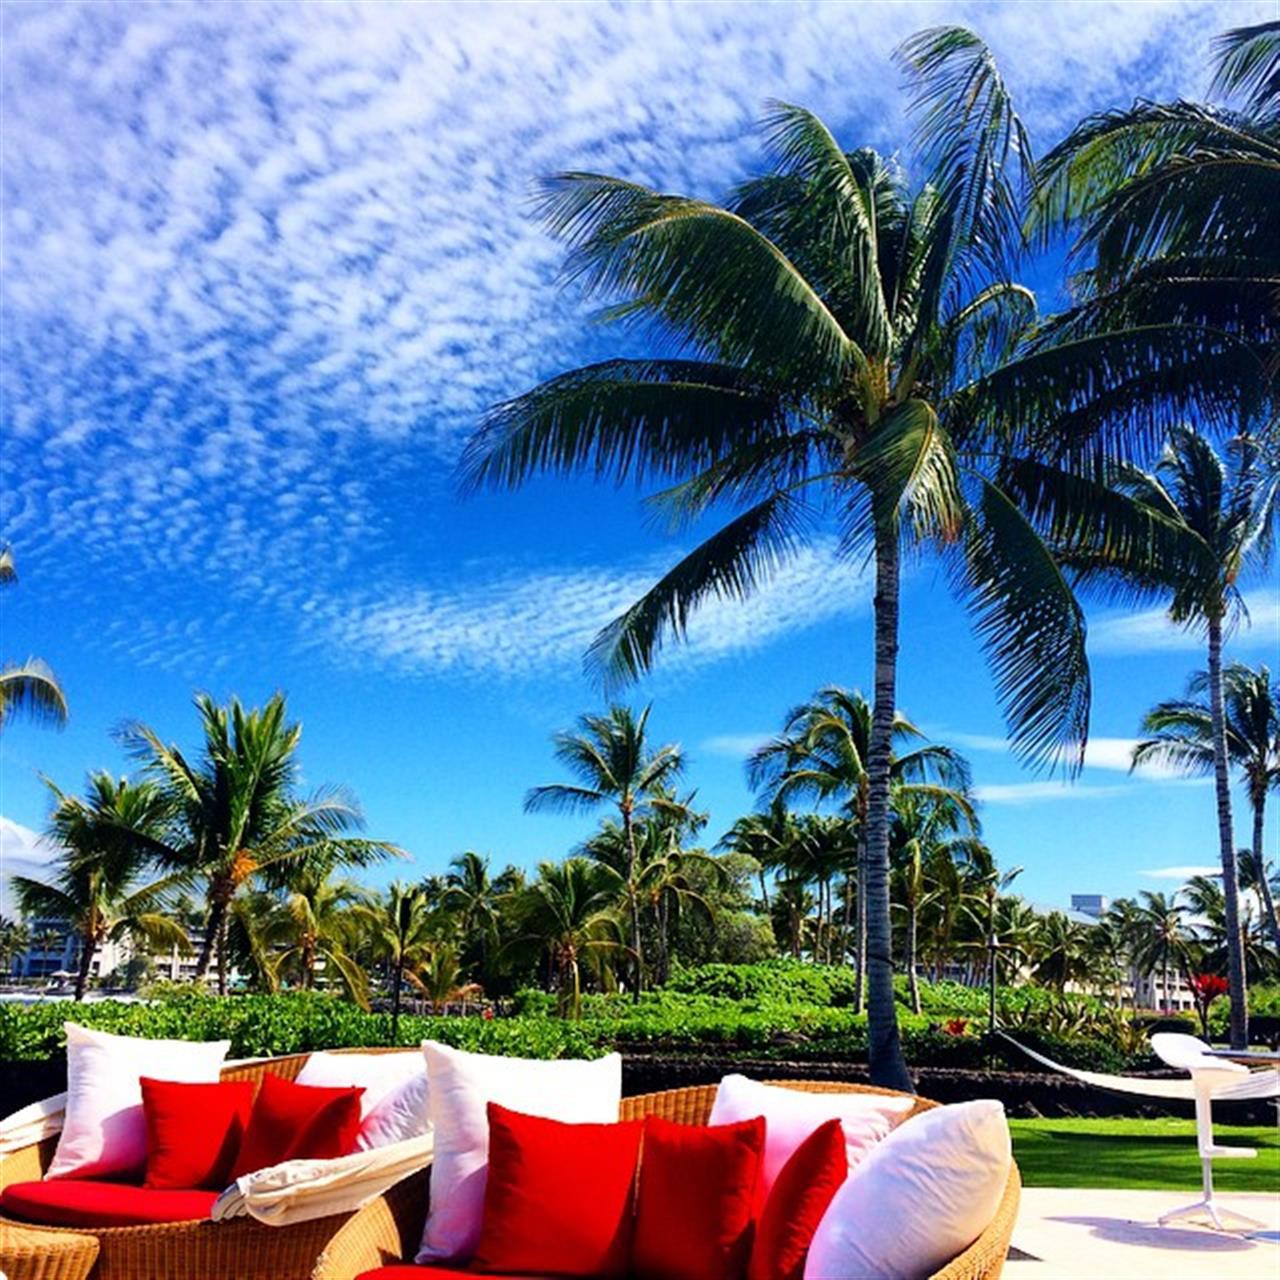 It's a beautiful day on the Kohala Coast! ??Love is in the air! ?? #happyALOHAfriday #fridaythe13th #beingbrooke #hawaiilife #beemary #maunalani #leadingRElocal